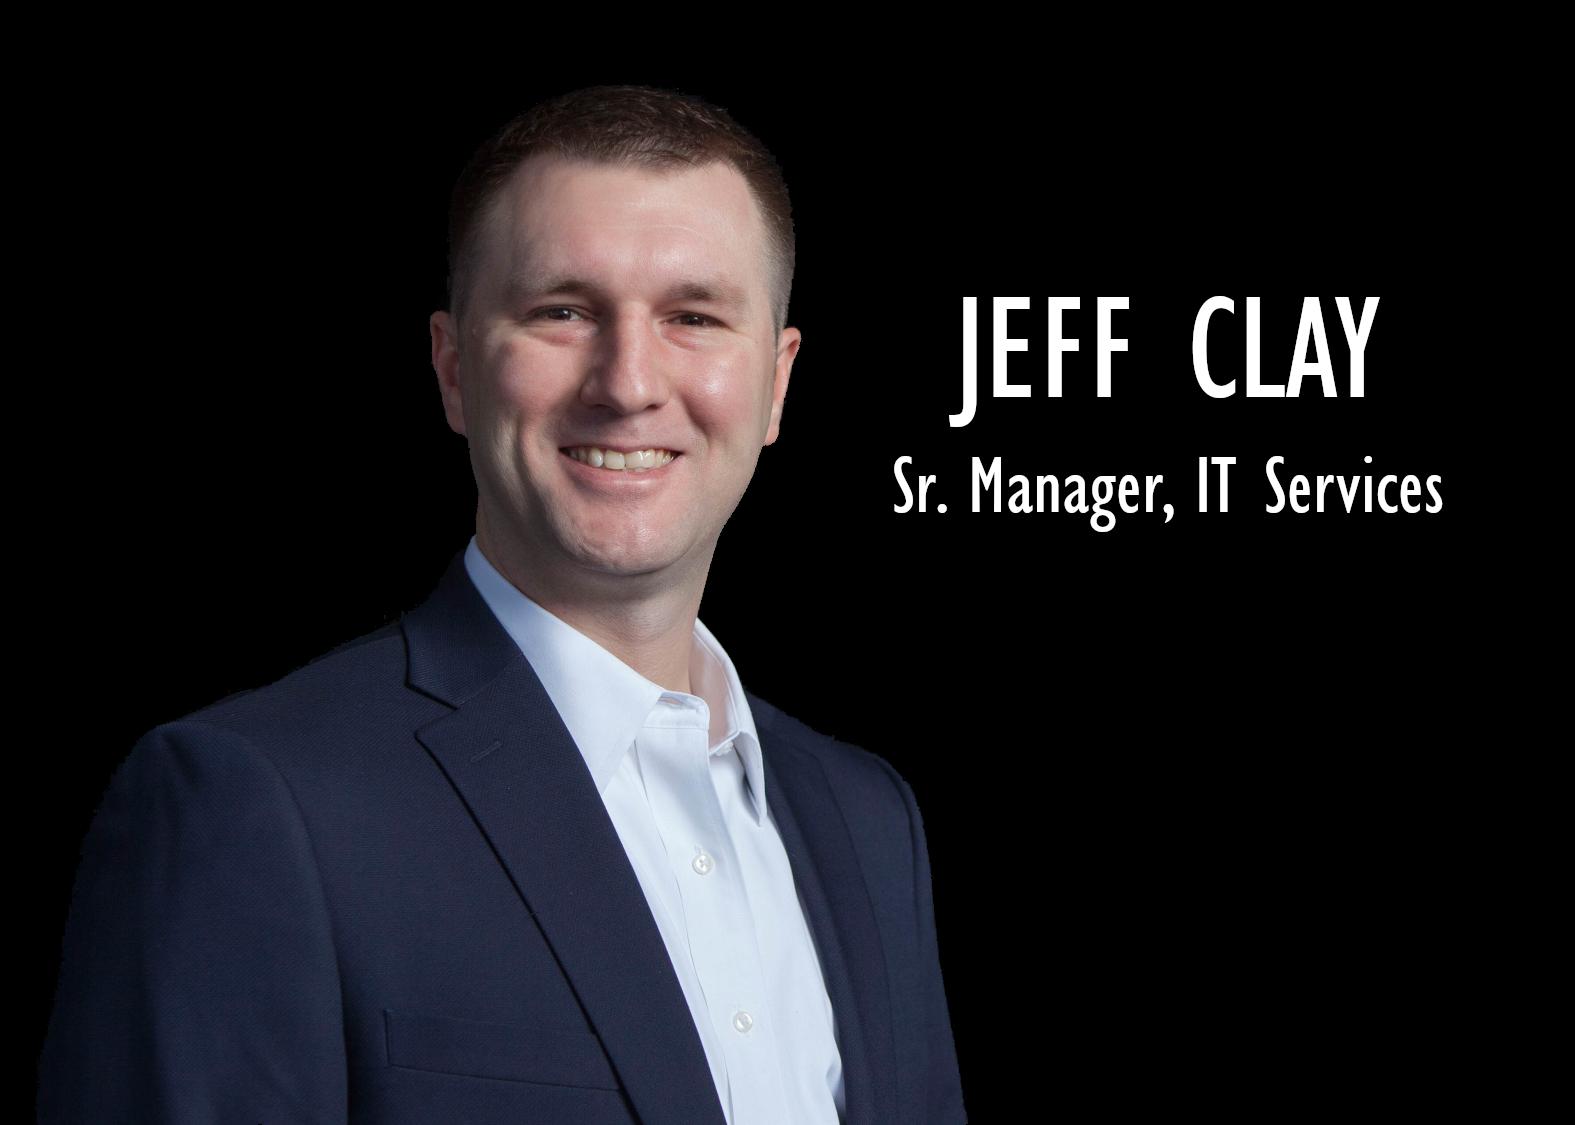 Jeff Clay